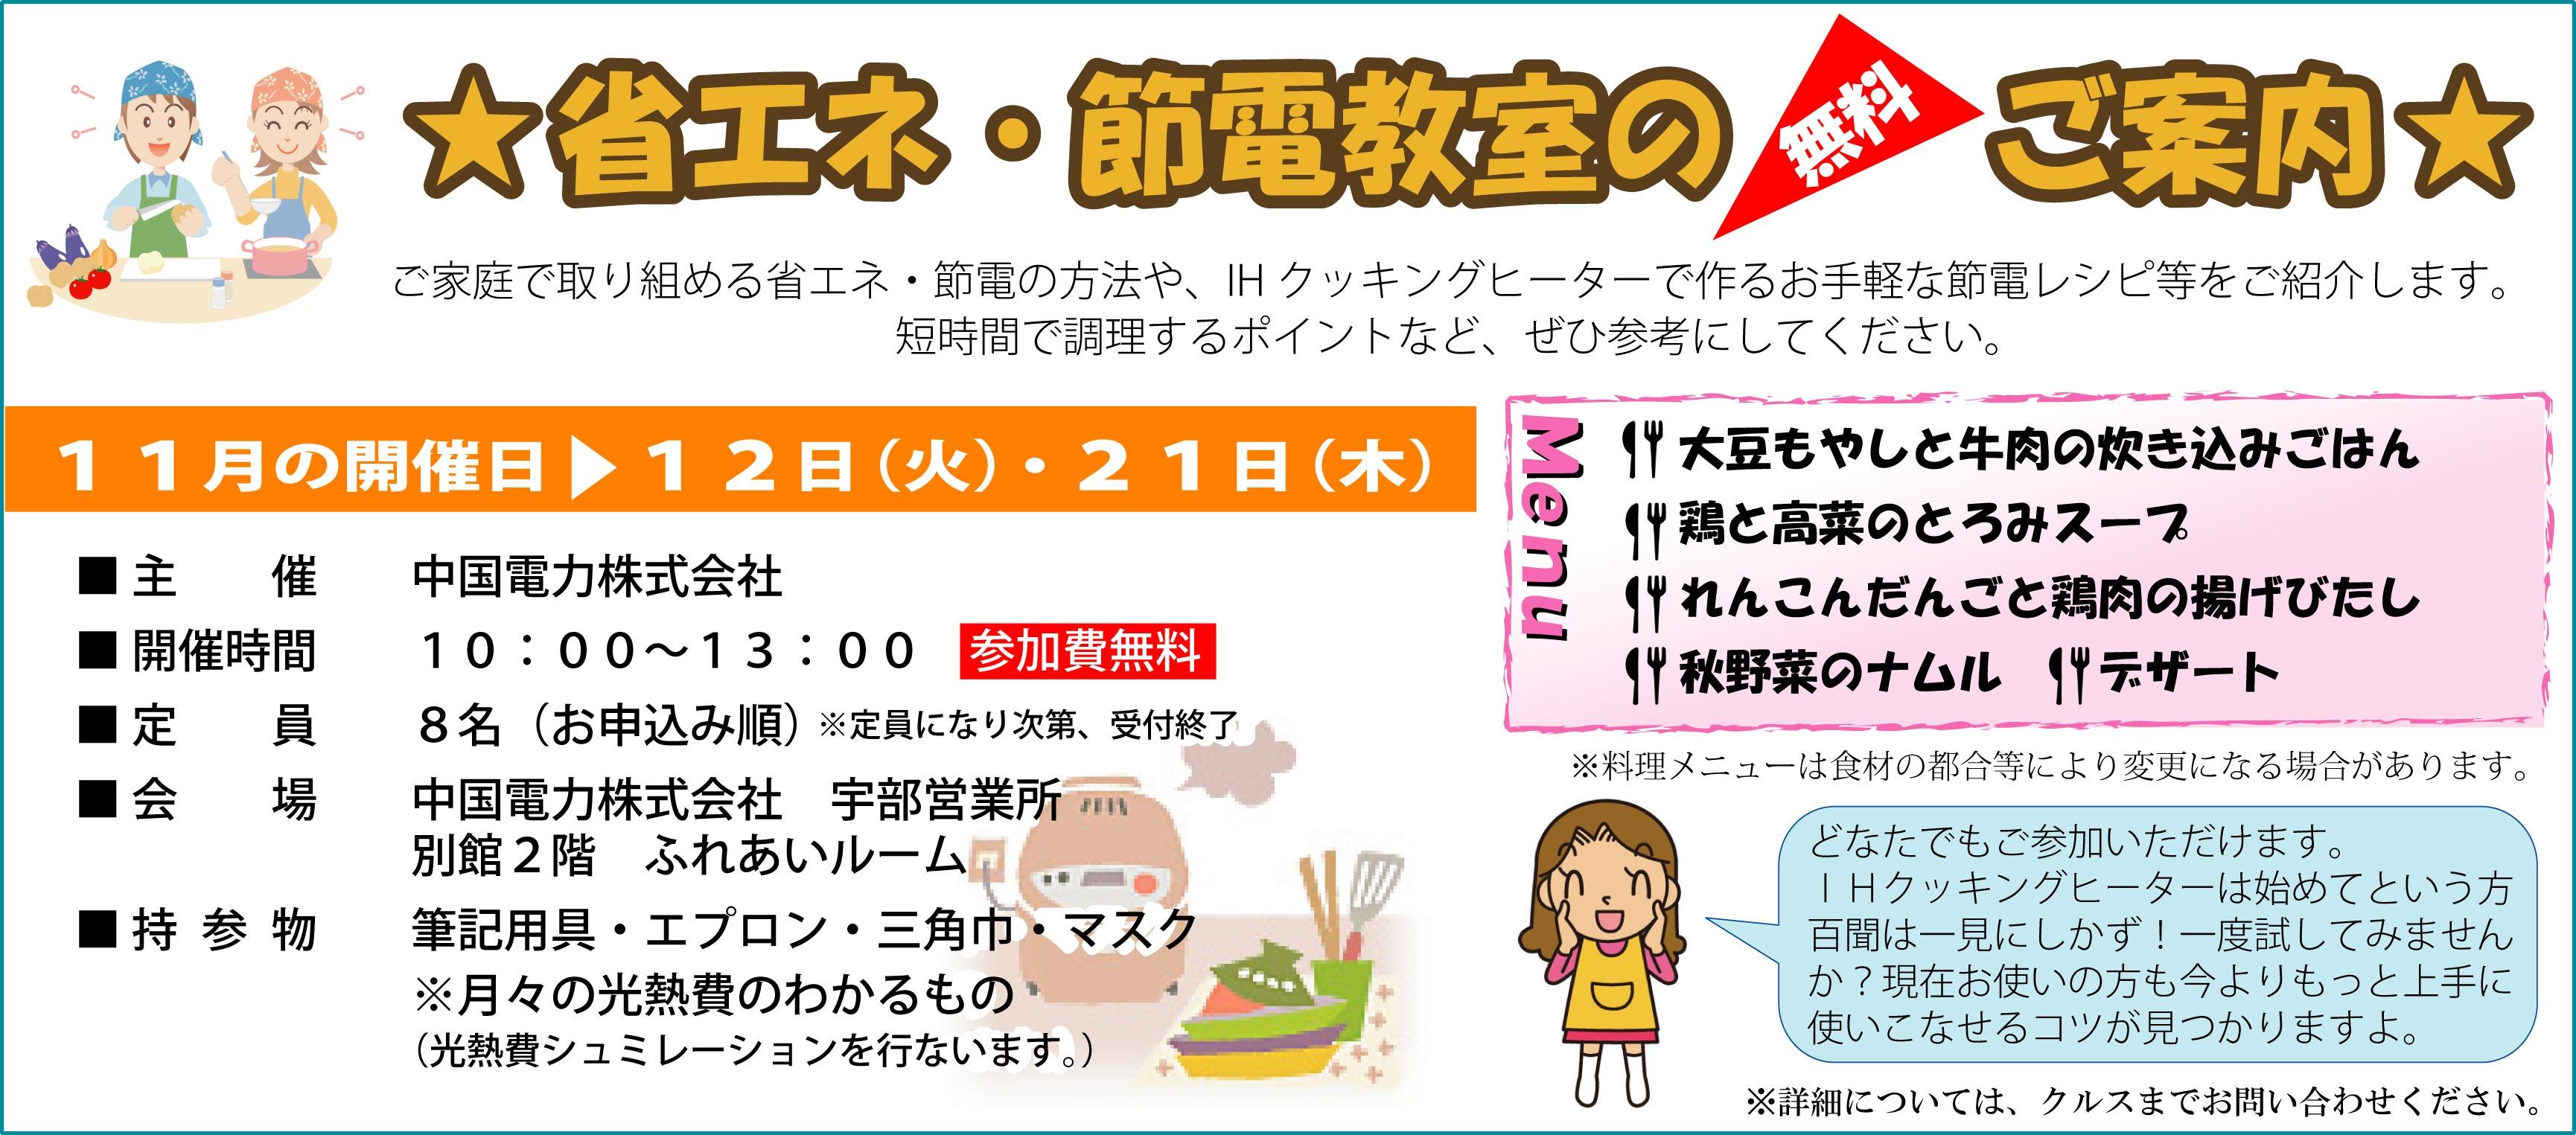 KuraSi-natu-sin77-06.jpg